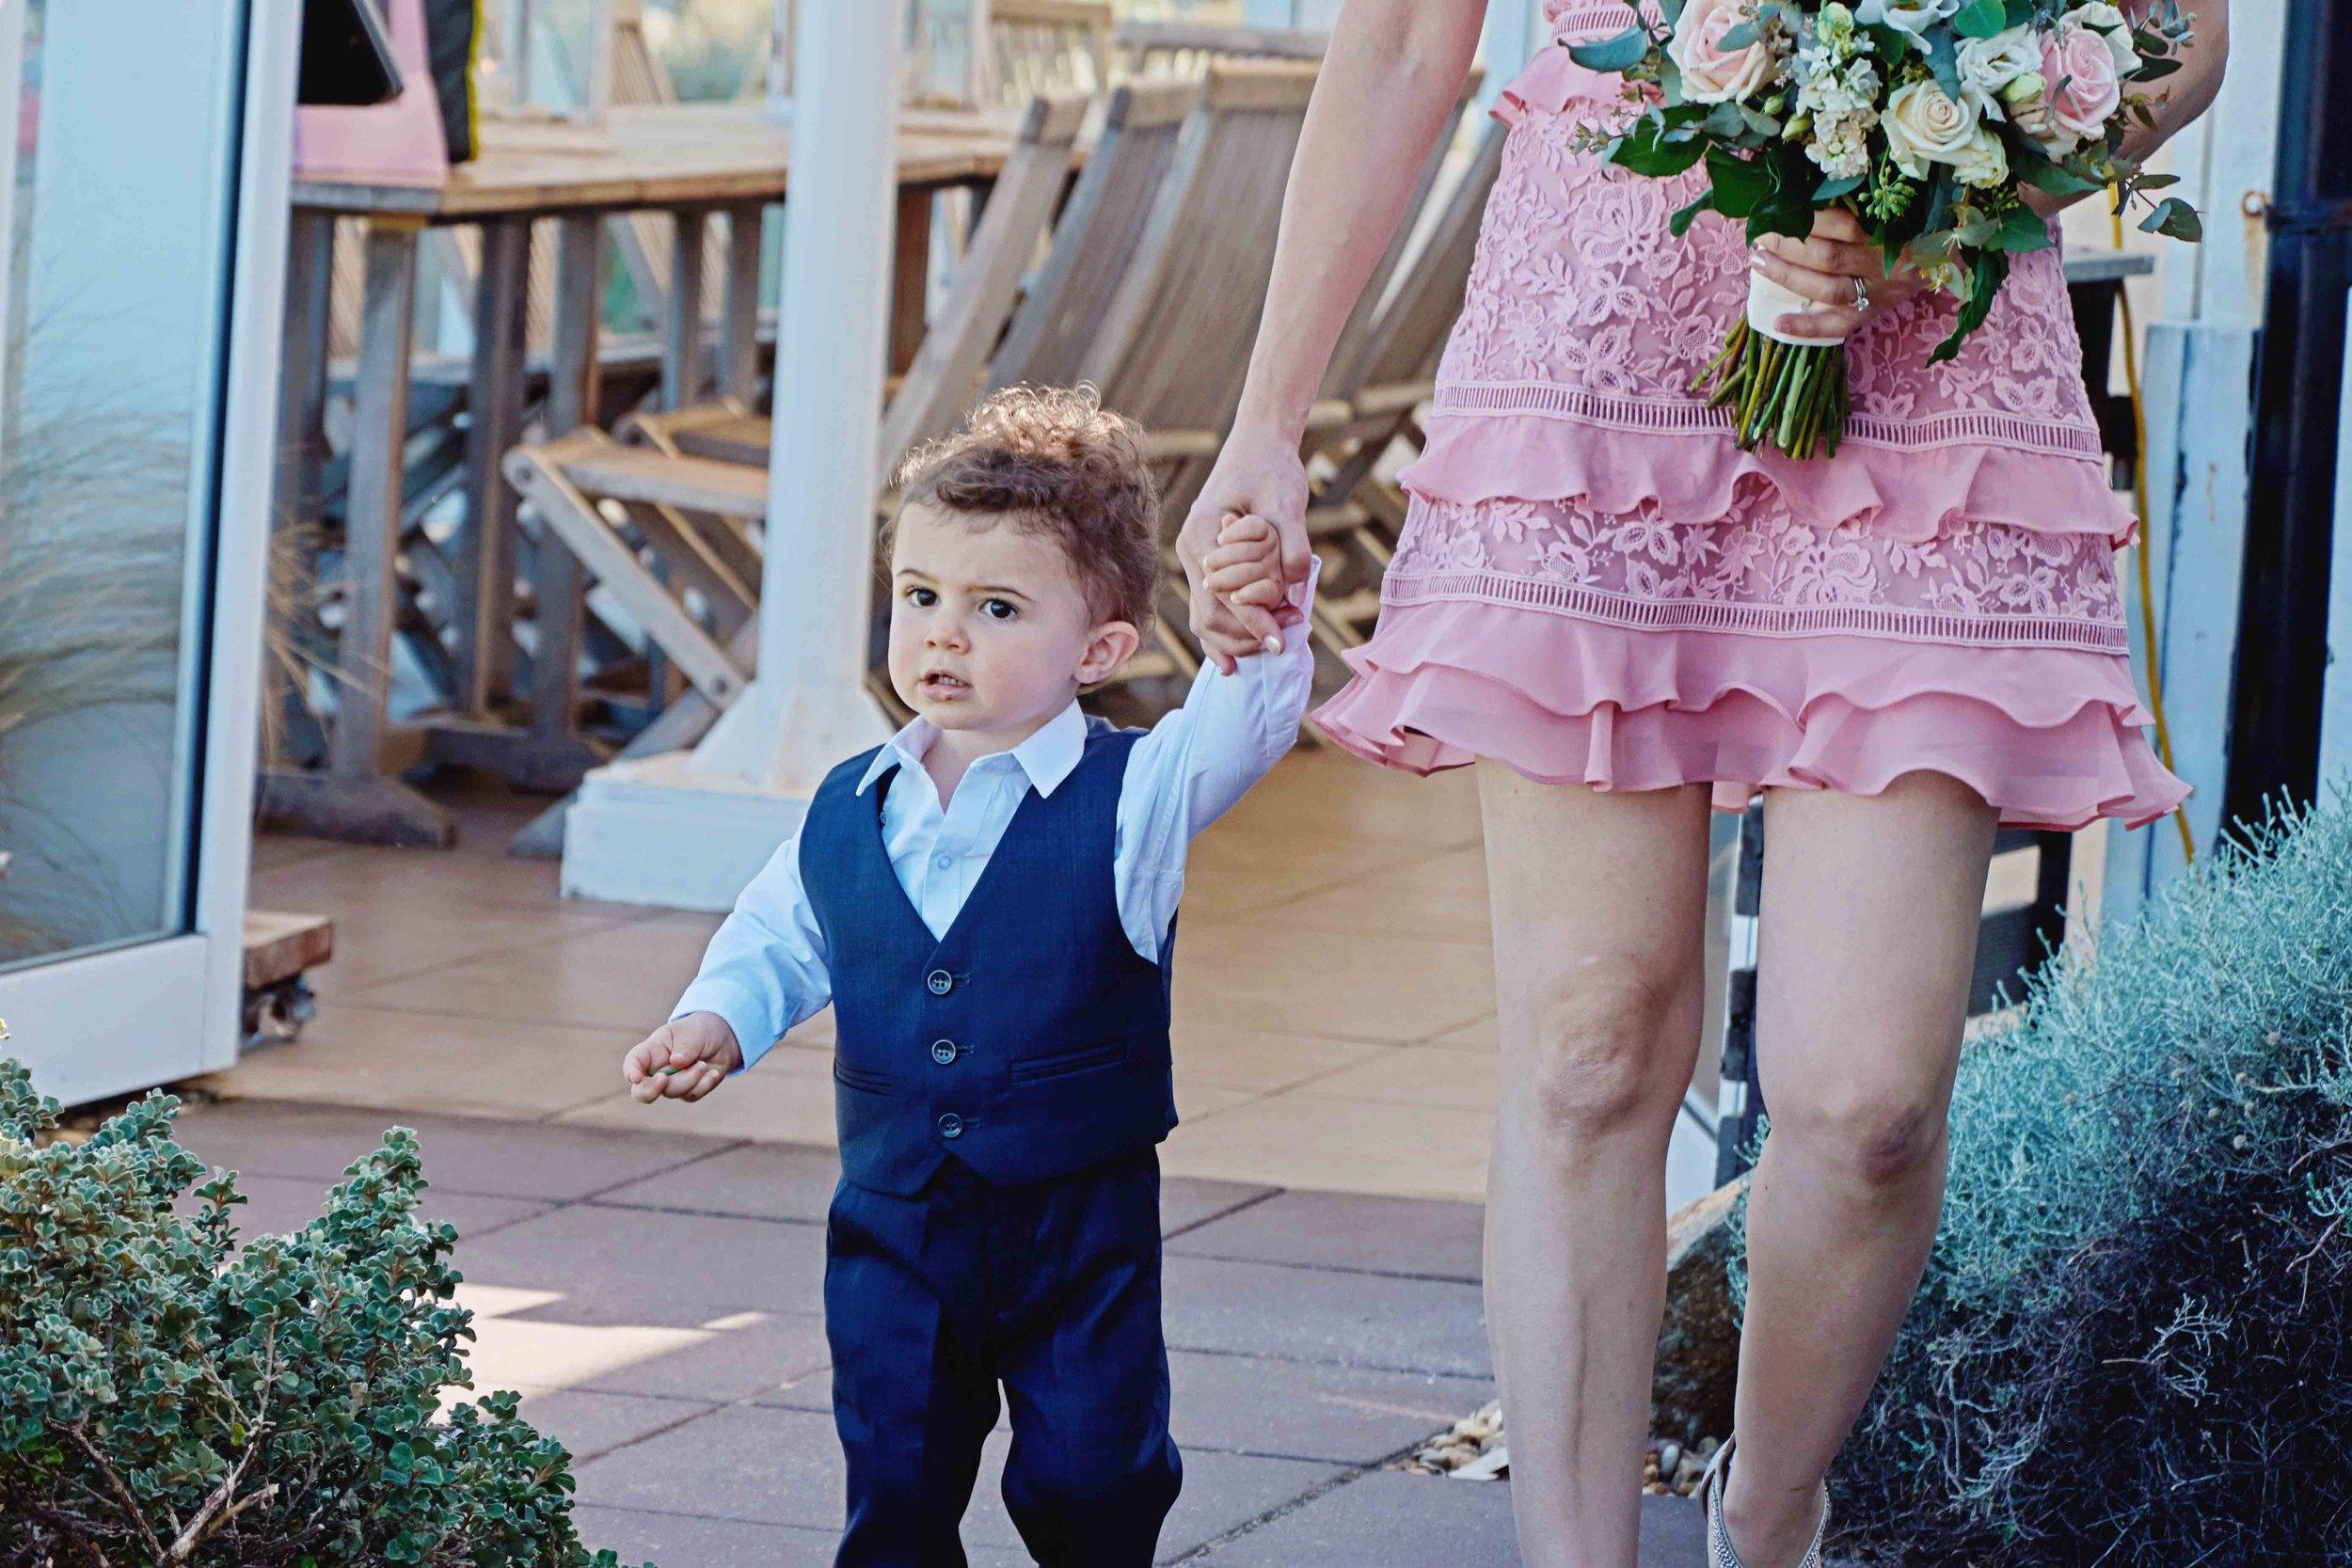 sorrento-wedding-photography-all-smiles-marissa-jade-photography-37.jpg